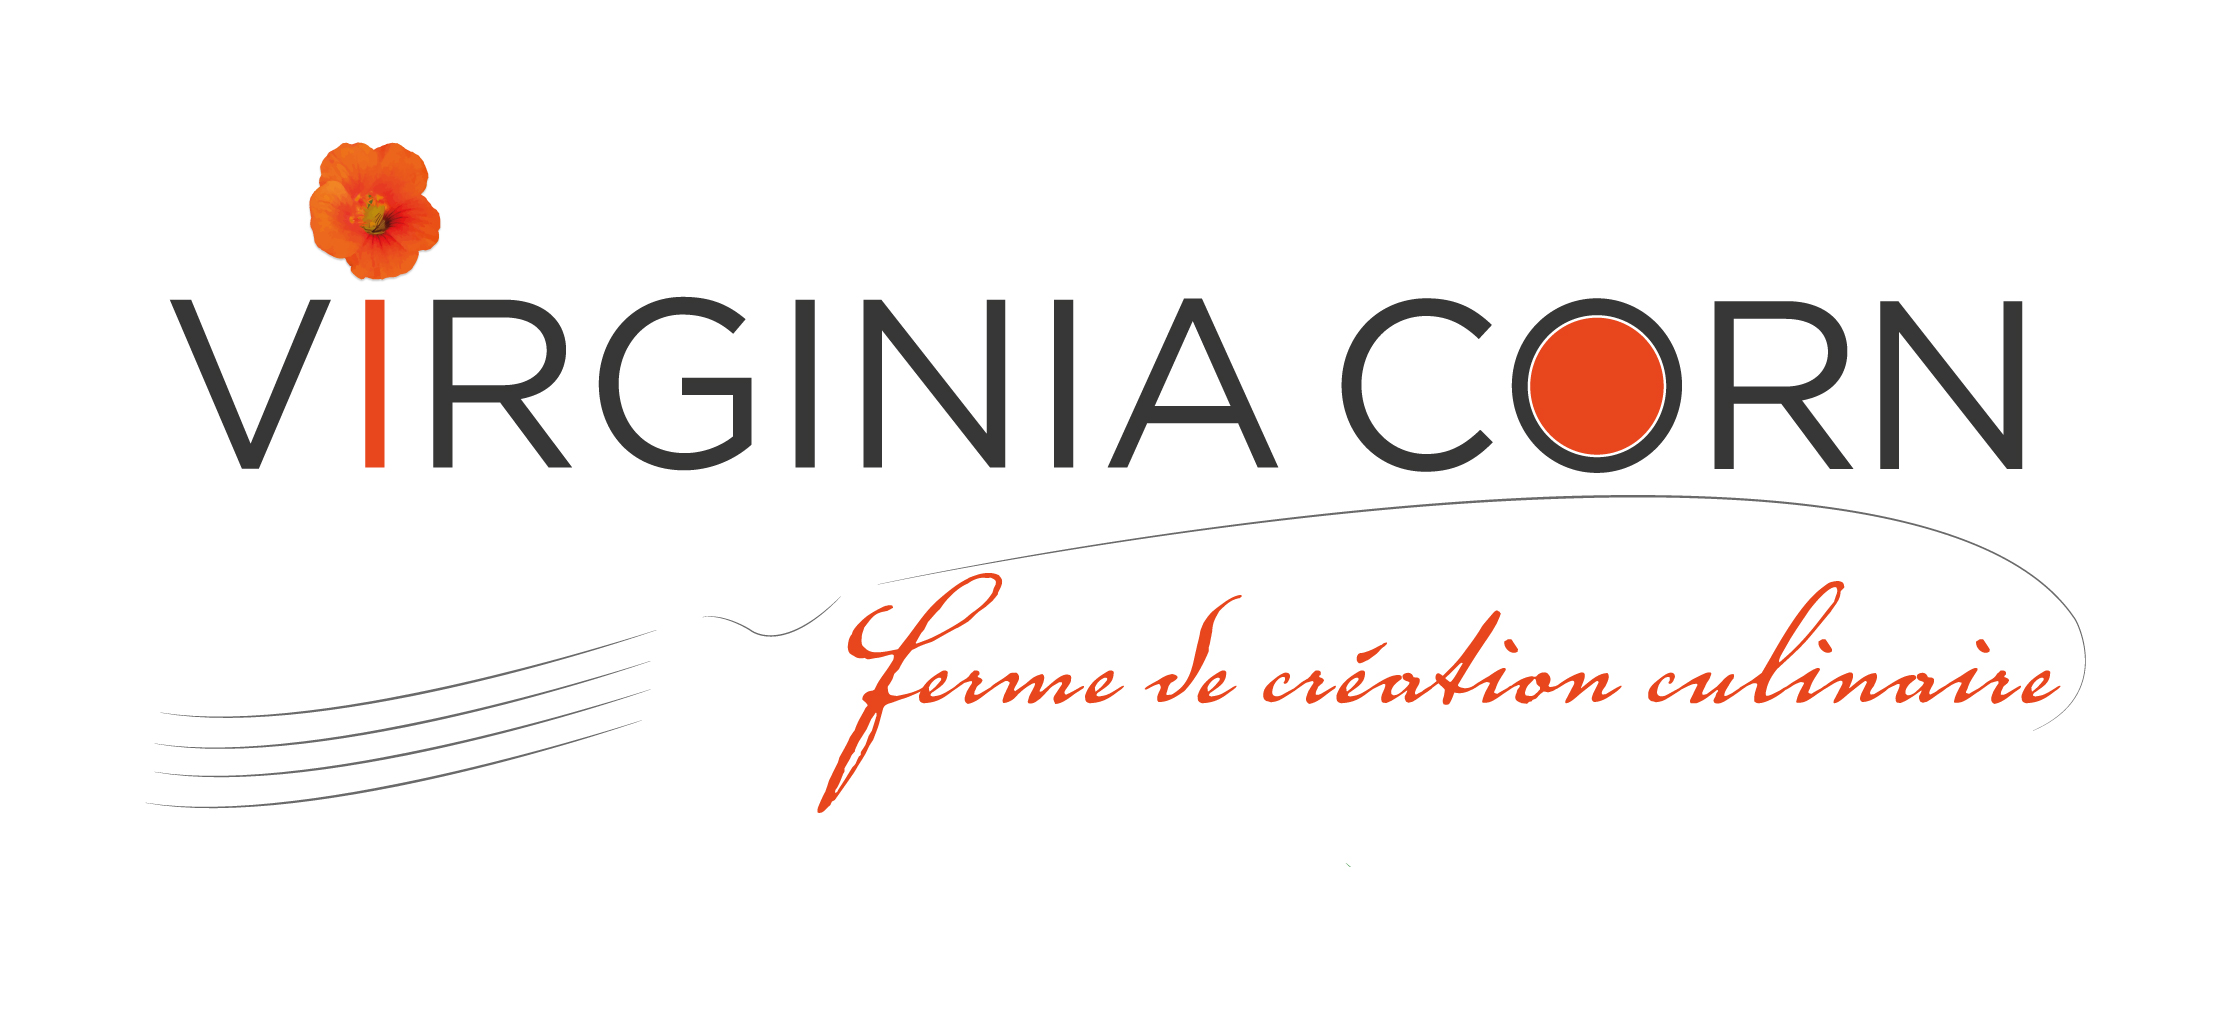 Virginia Corn